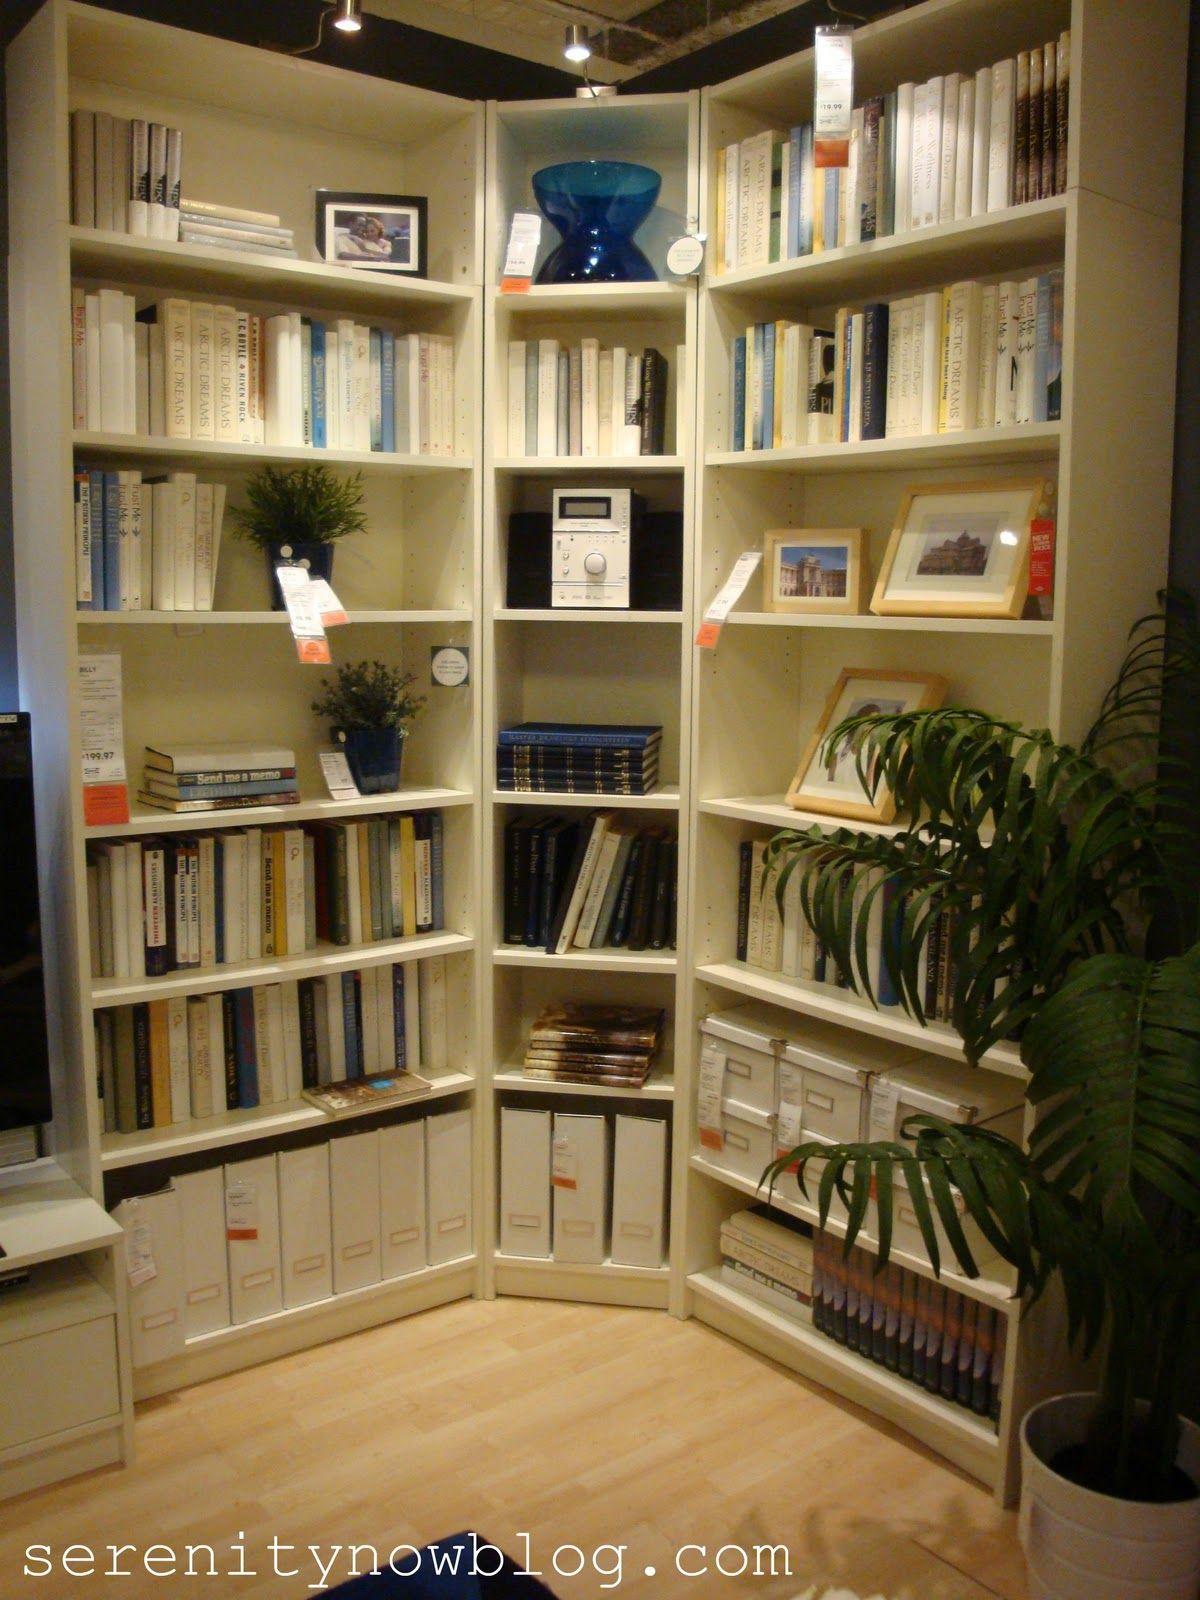 rhviveraticom win shelf corner bookcase kallax tall bookcases black off bookshelf unit ikea u glass rhcom your shelvester